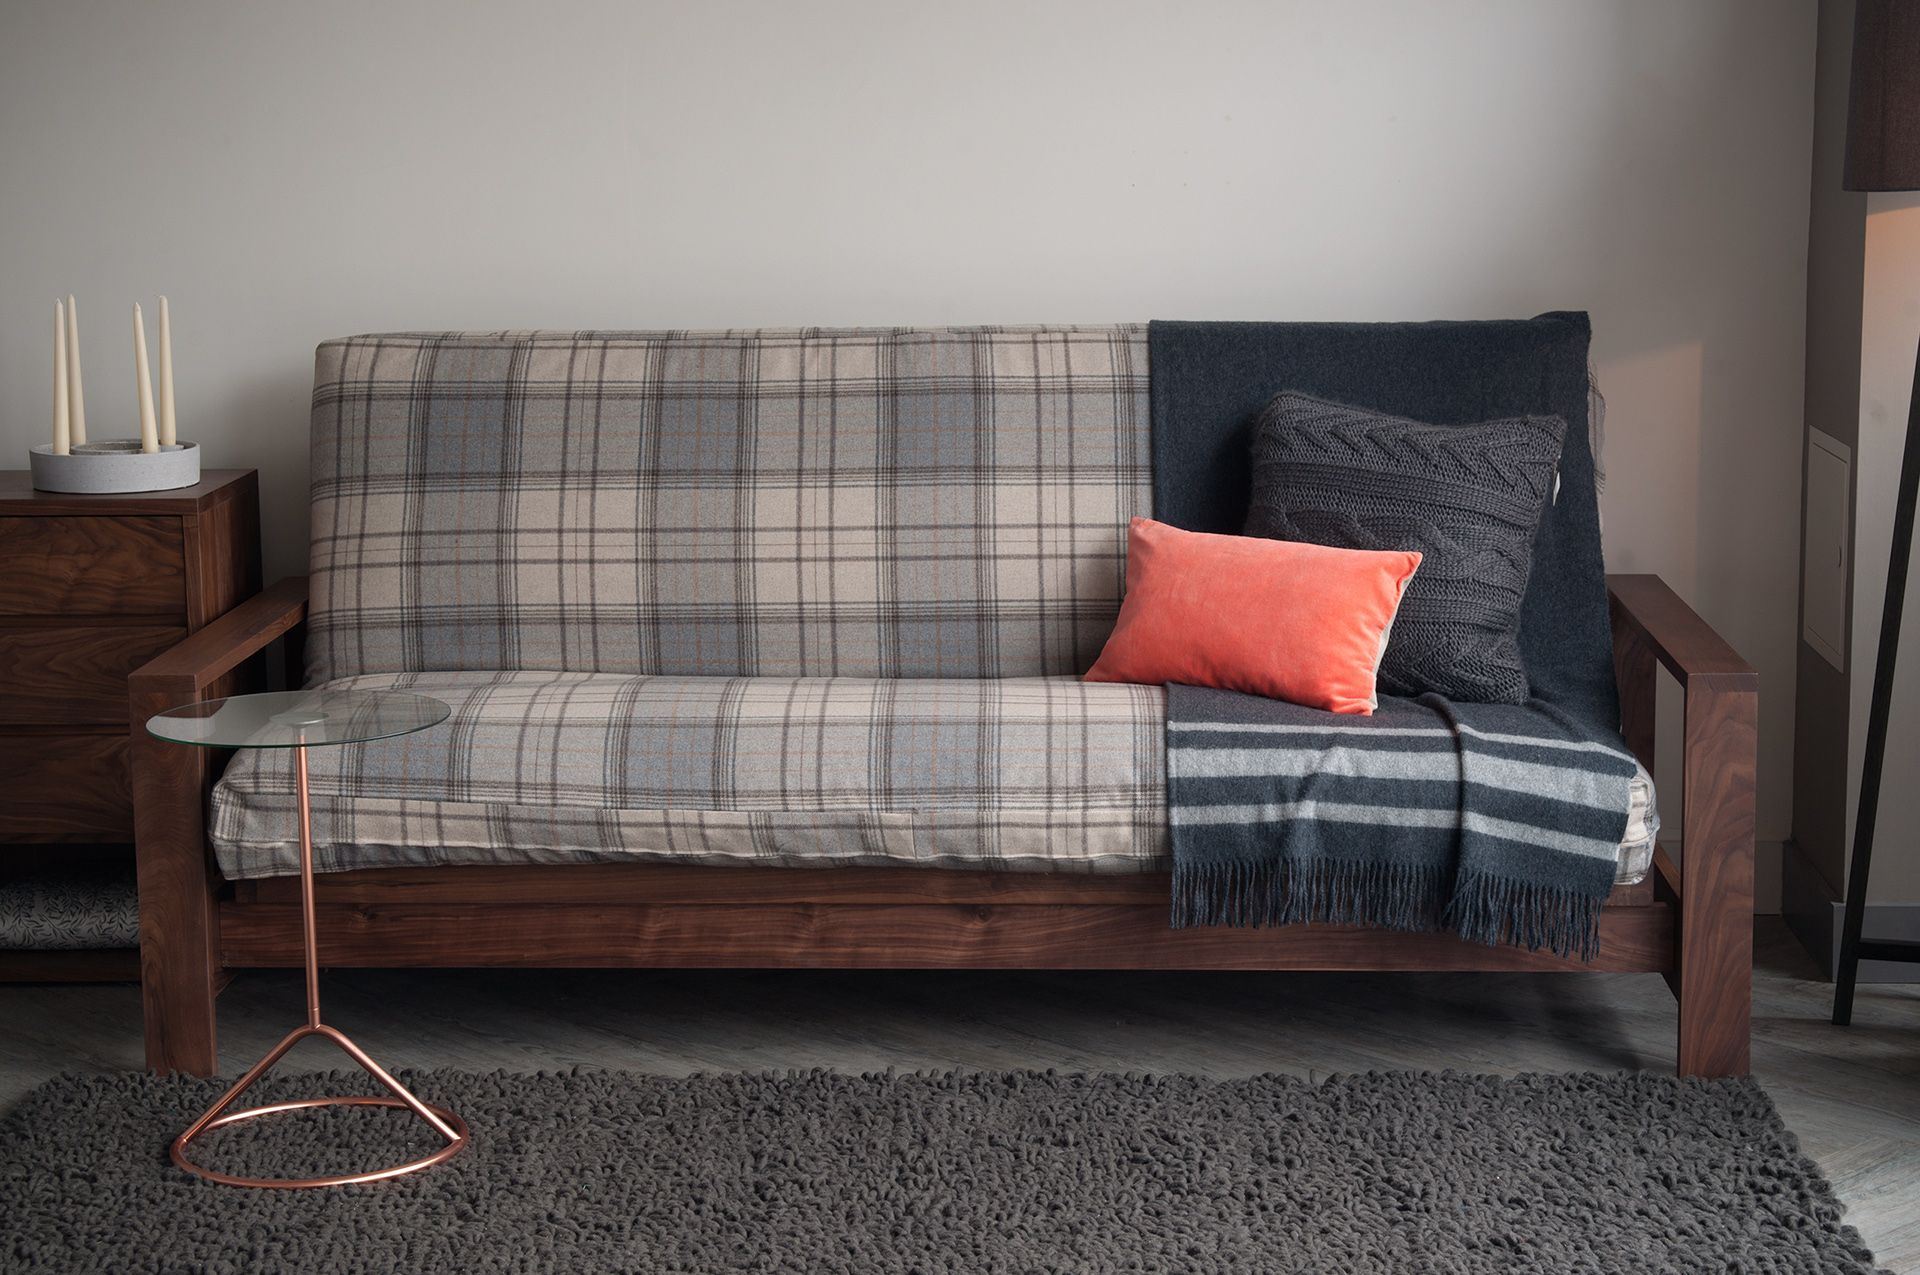 Sensational Black Lotus Cuba Sofa Bed Front2 Garnitura To Make Futon Andrewgaddart Wooden Chair Designs For Living Room Andrewgaddartcom